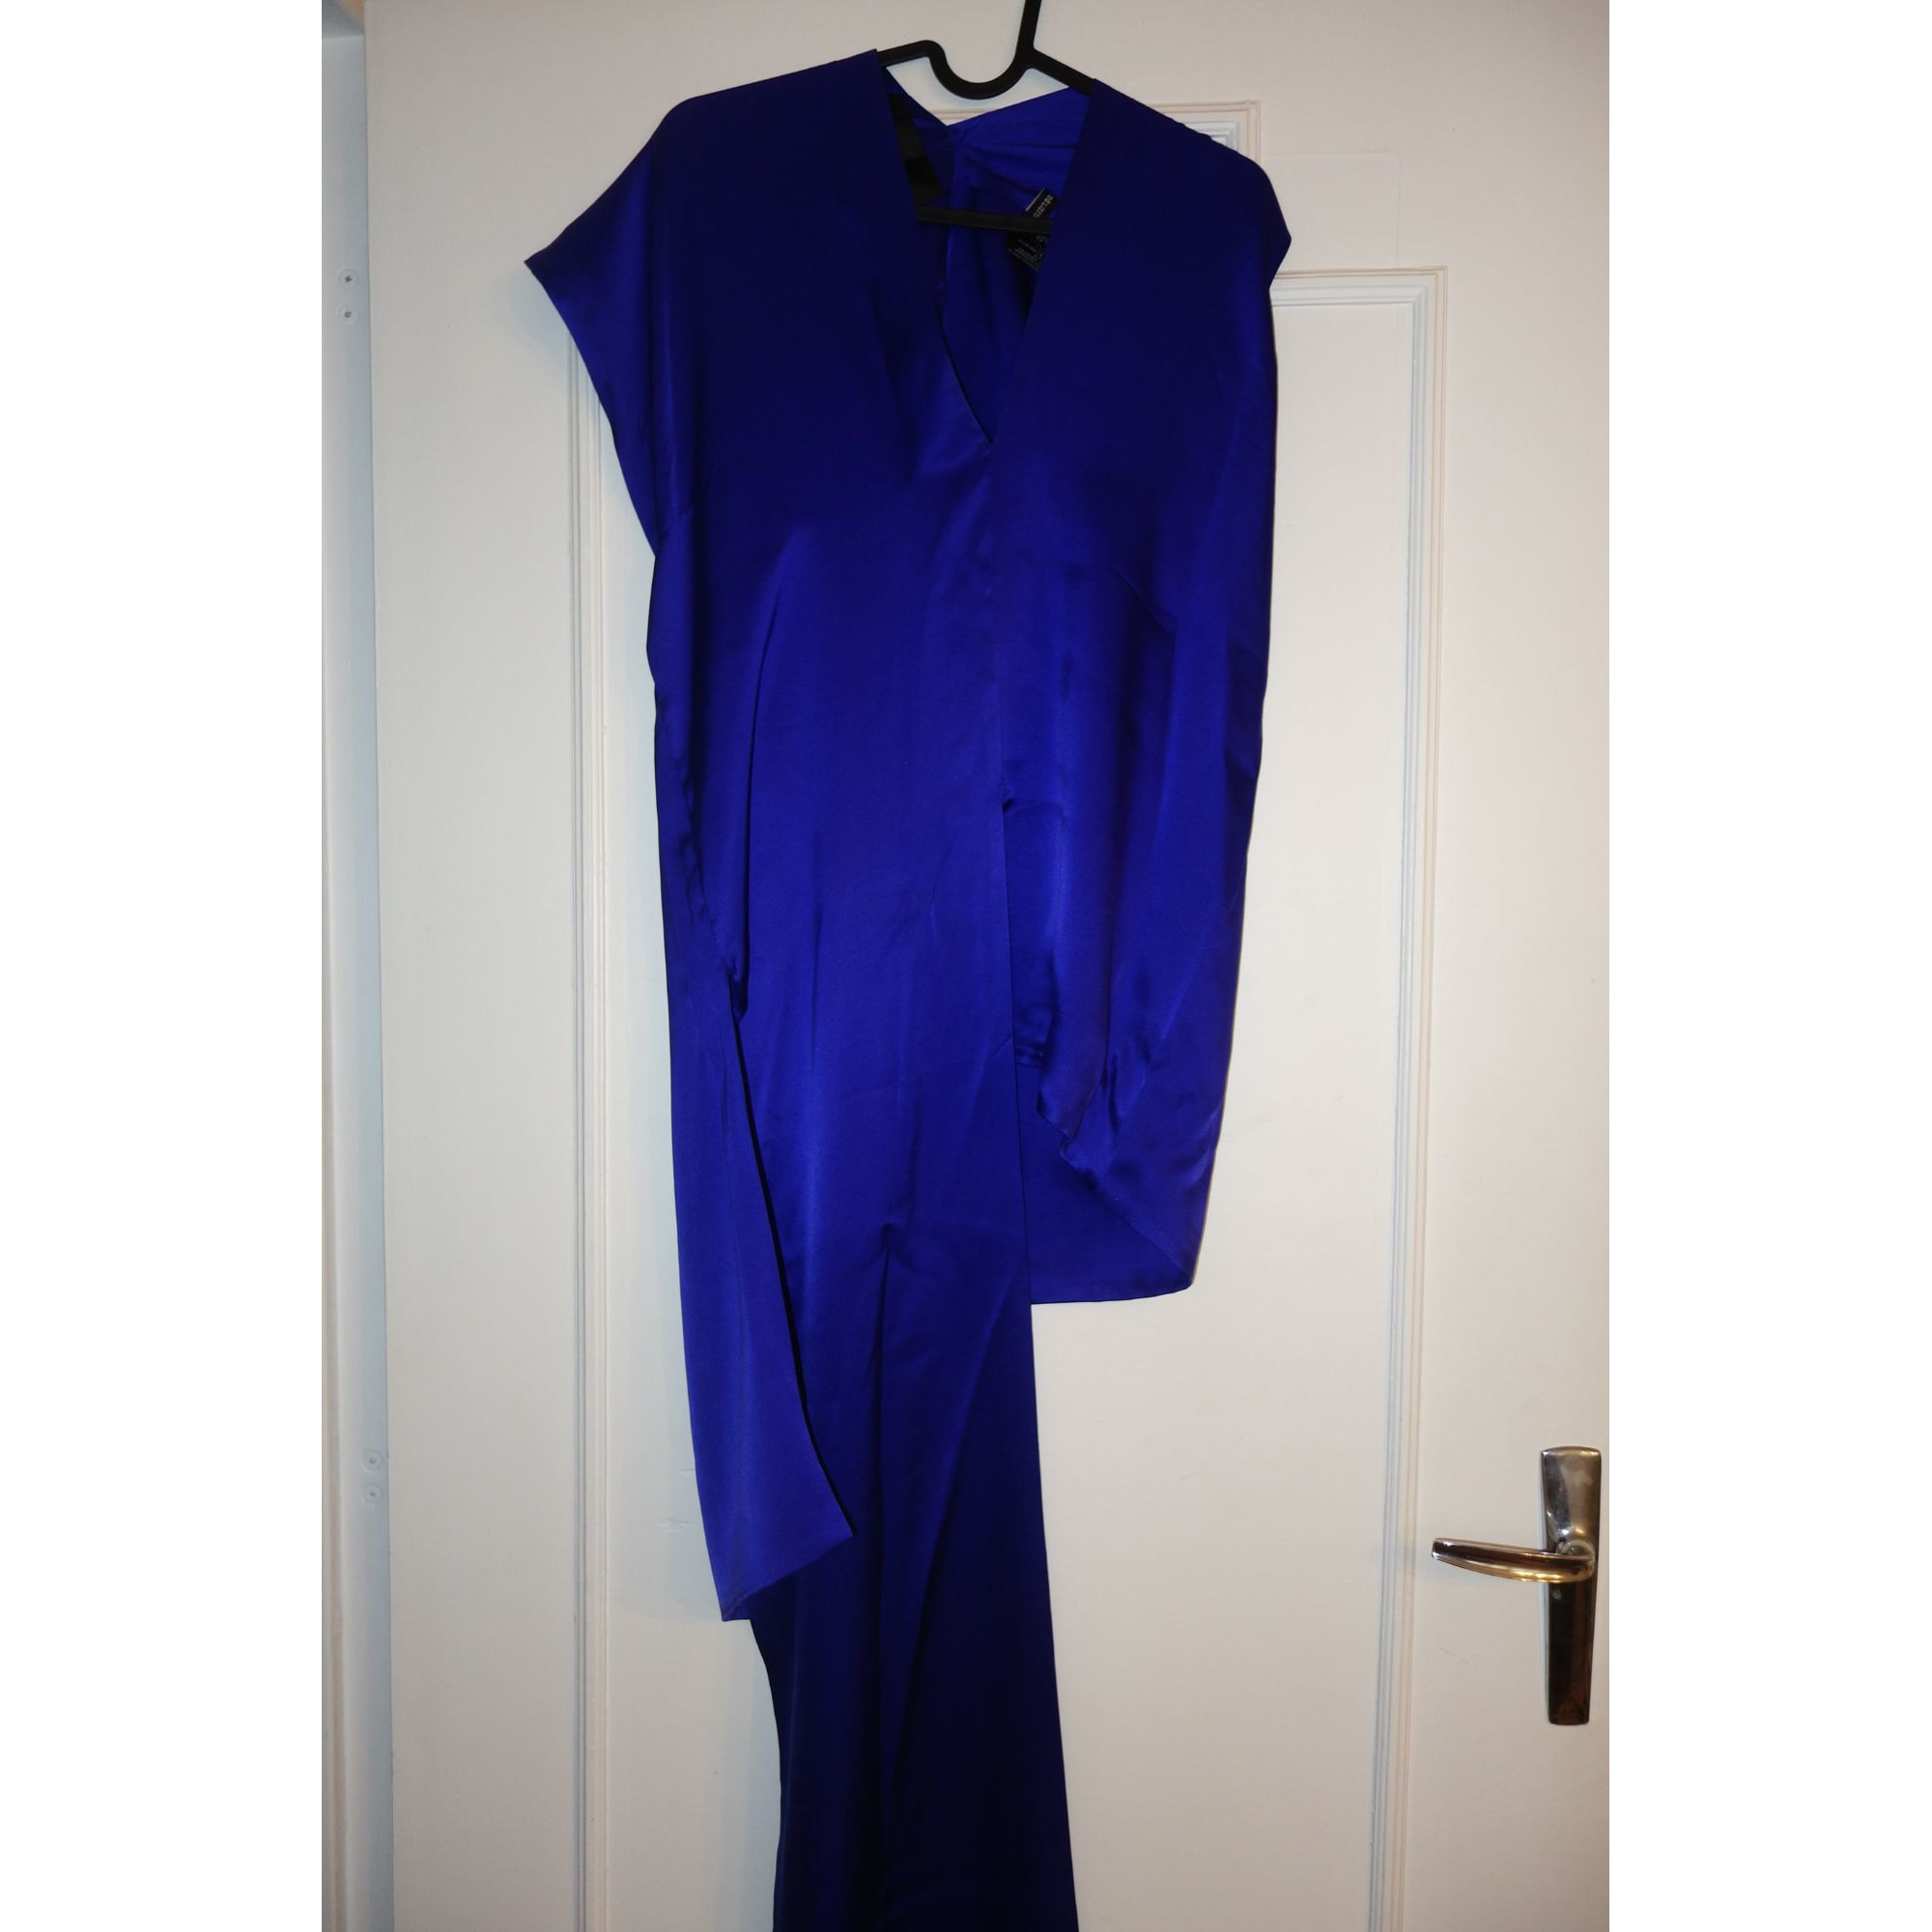 Top, tee-shirt HAIDER ACKERMANN Bleu, bleu marine, bleu turquoise